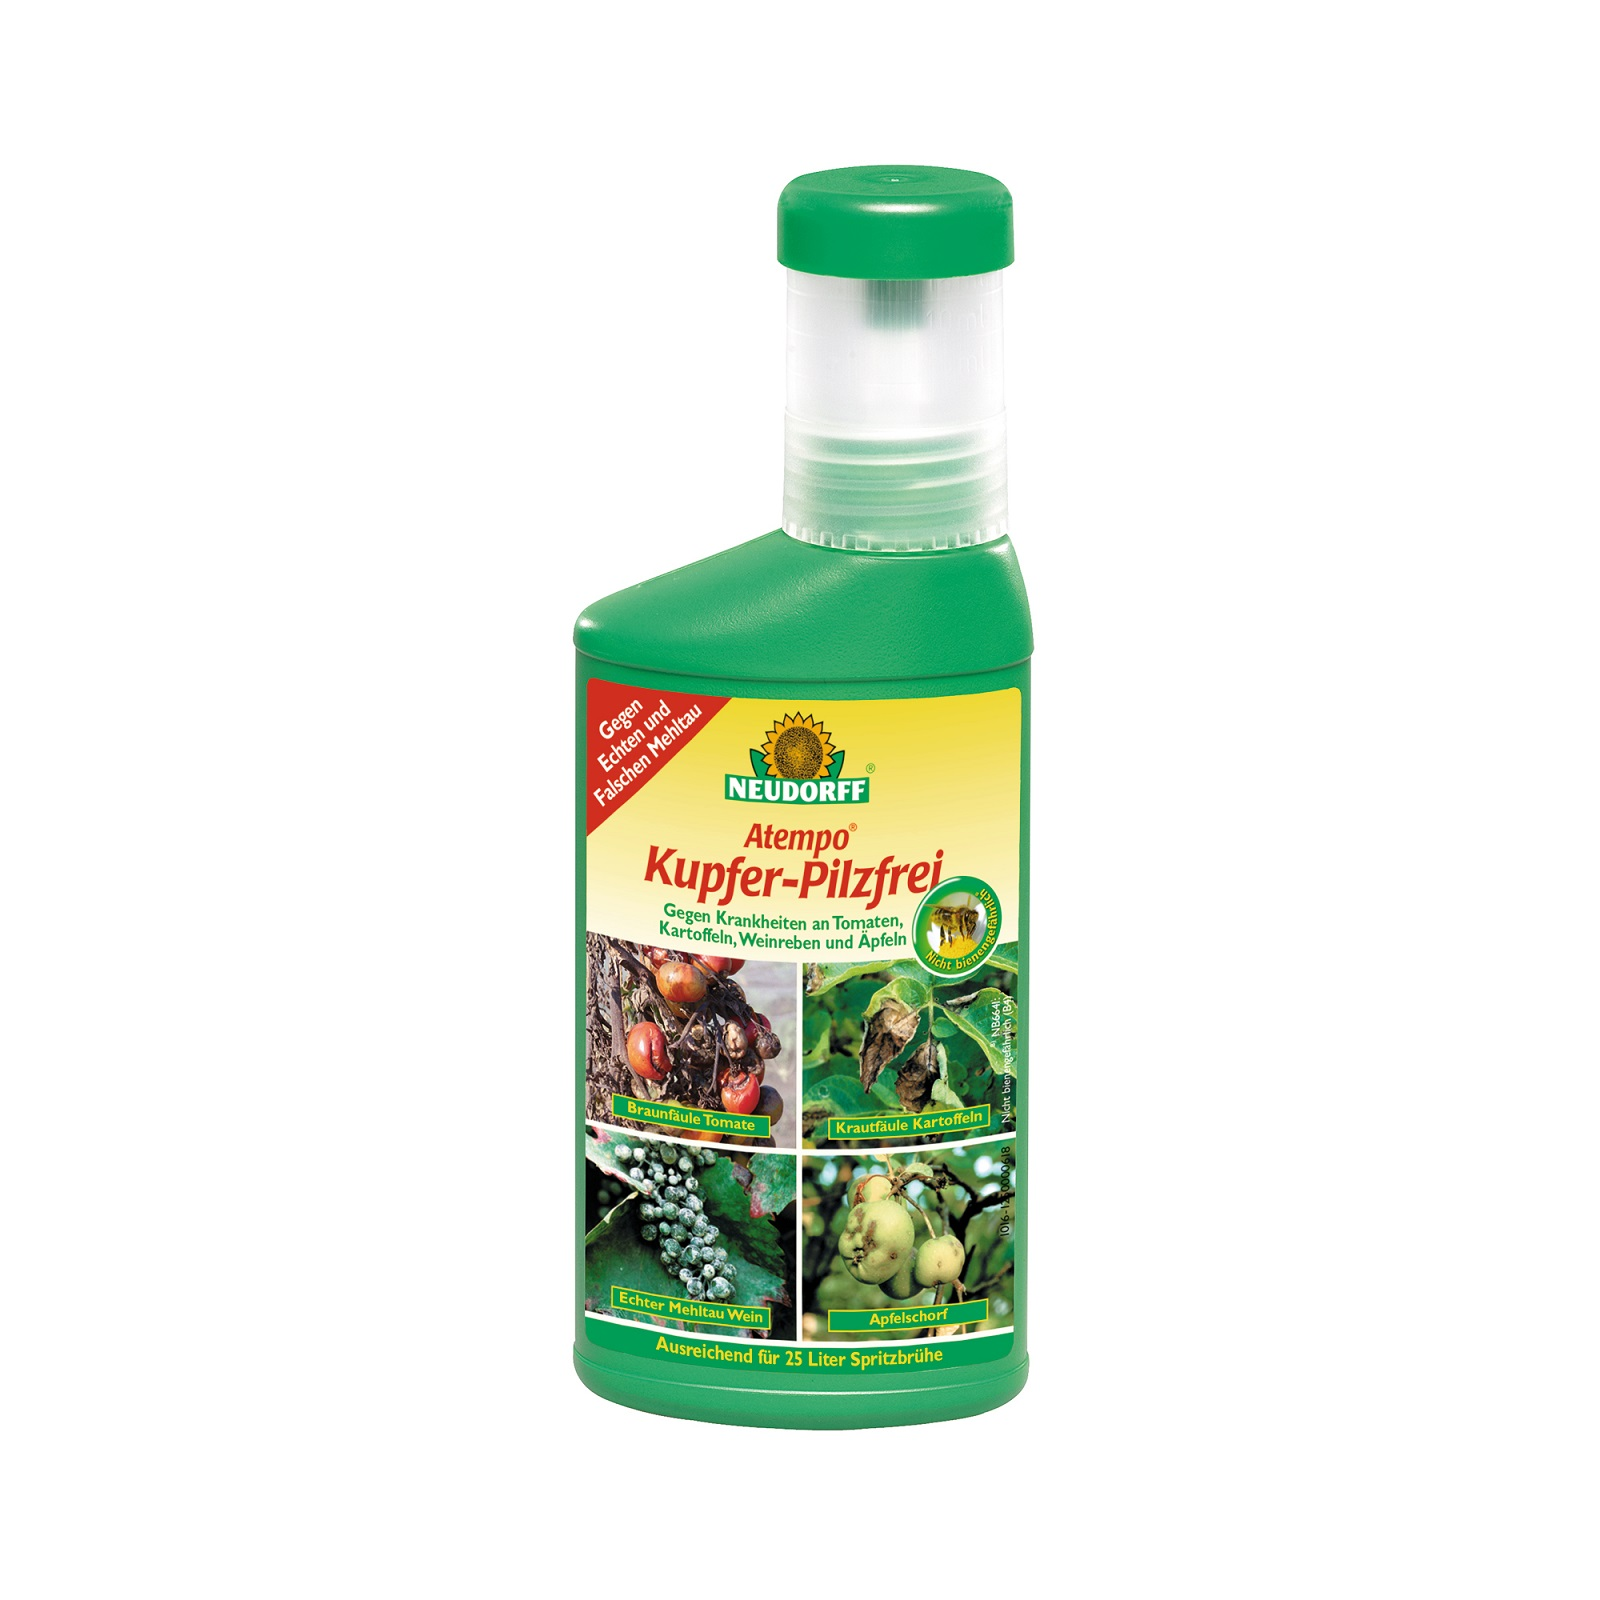 Neudorff Atempo Kupfer-Pilzfrei 250 ml